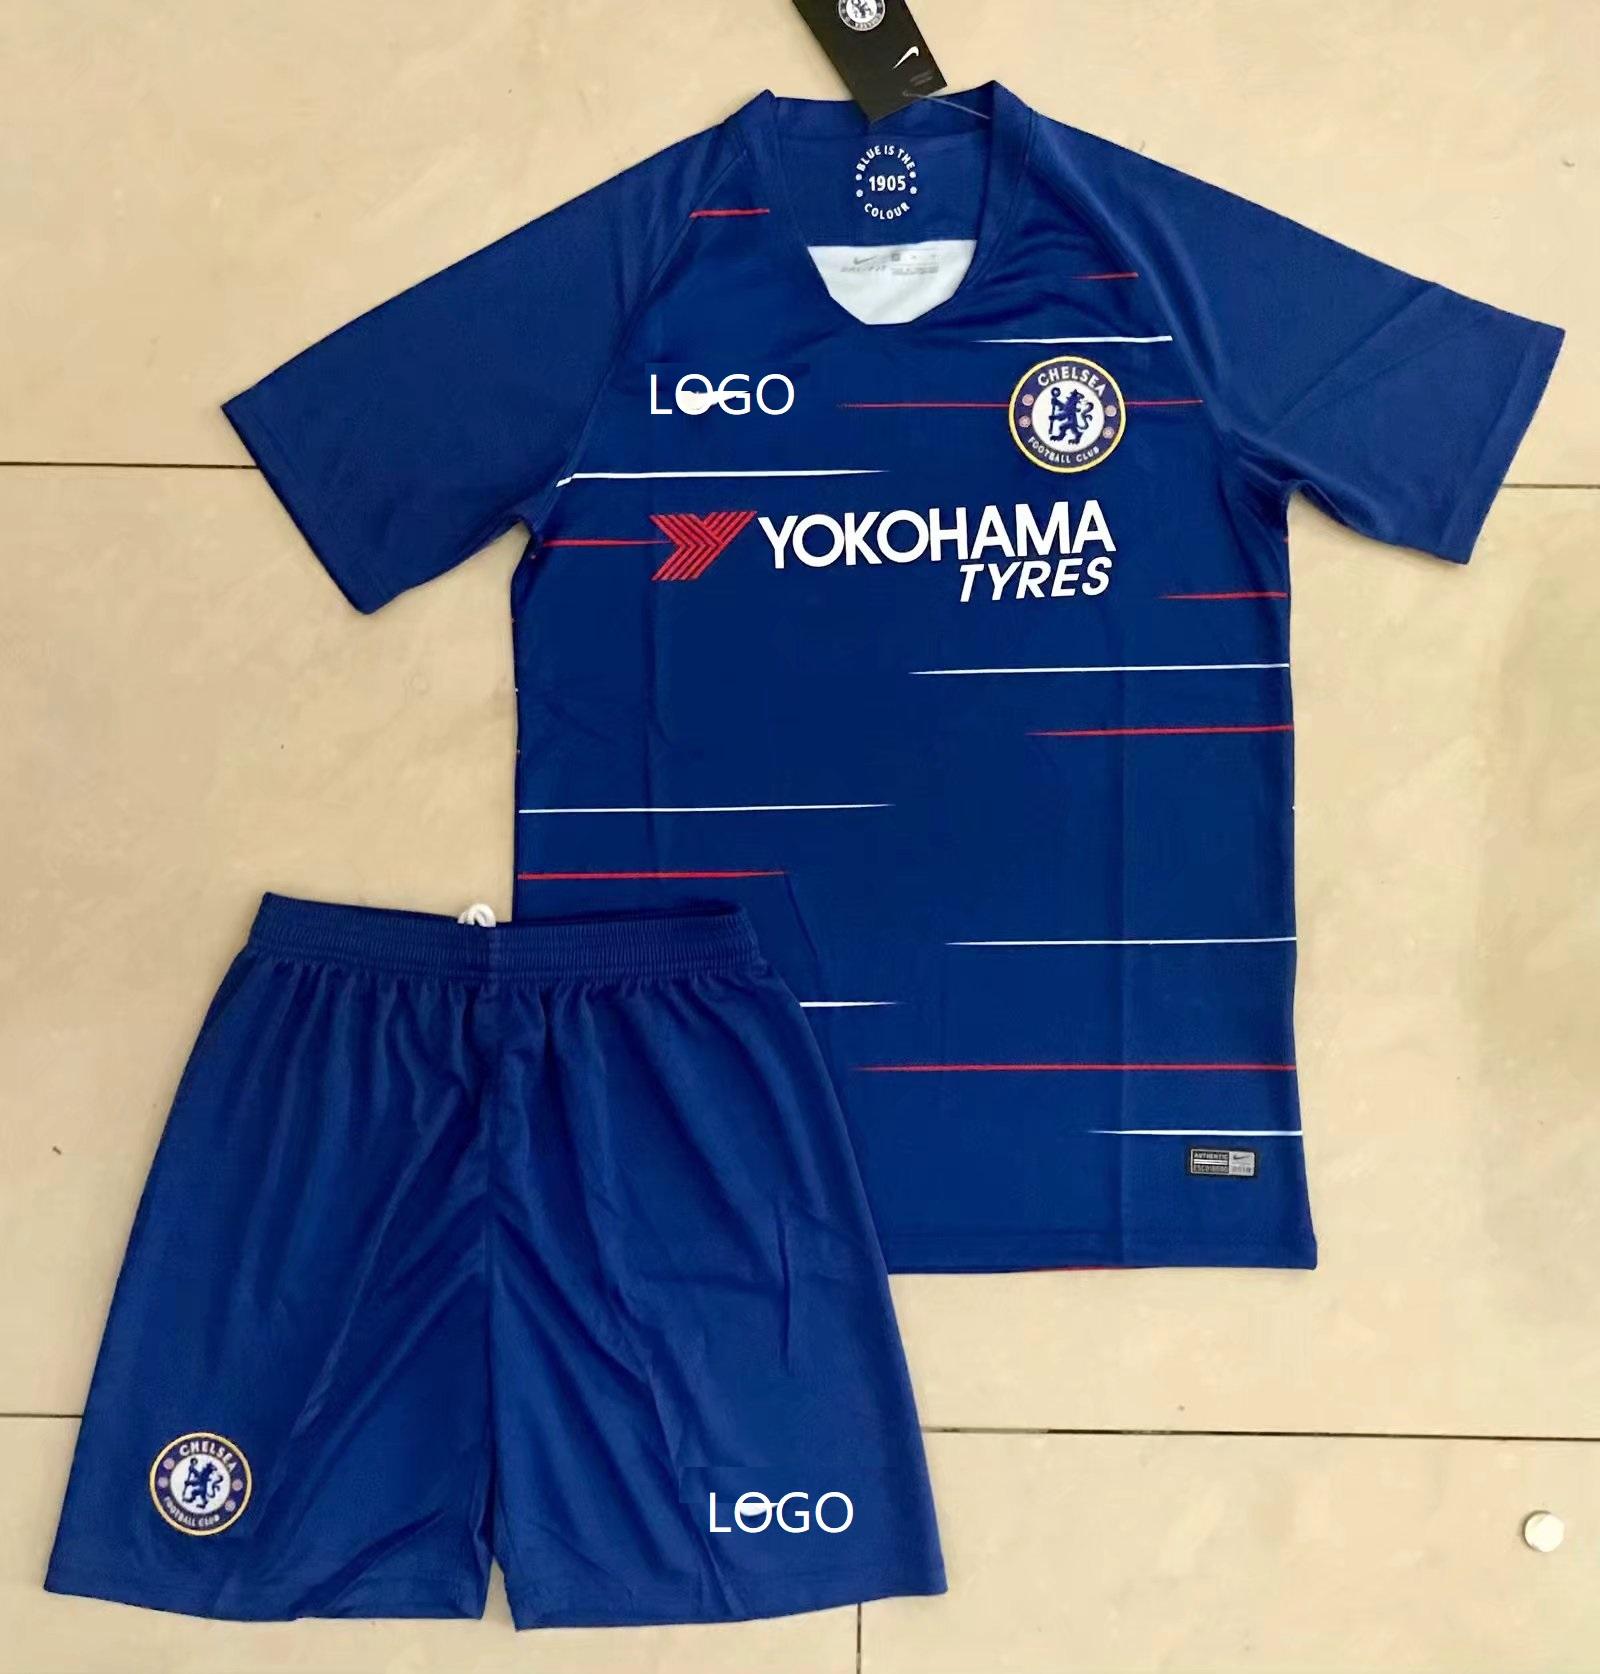 a540dafe2 18 19 Cheap Adult Chelsea Soccer Jersey Blue Uniform Men Football Kits  Wholesale soccer uniforms Item NO  Chelsea